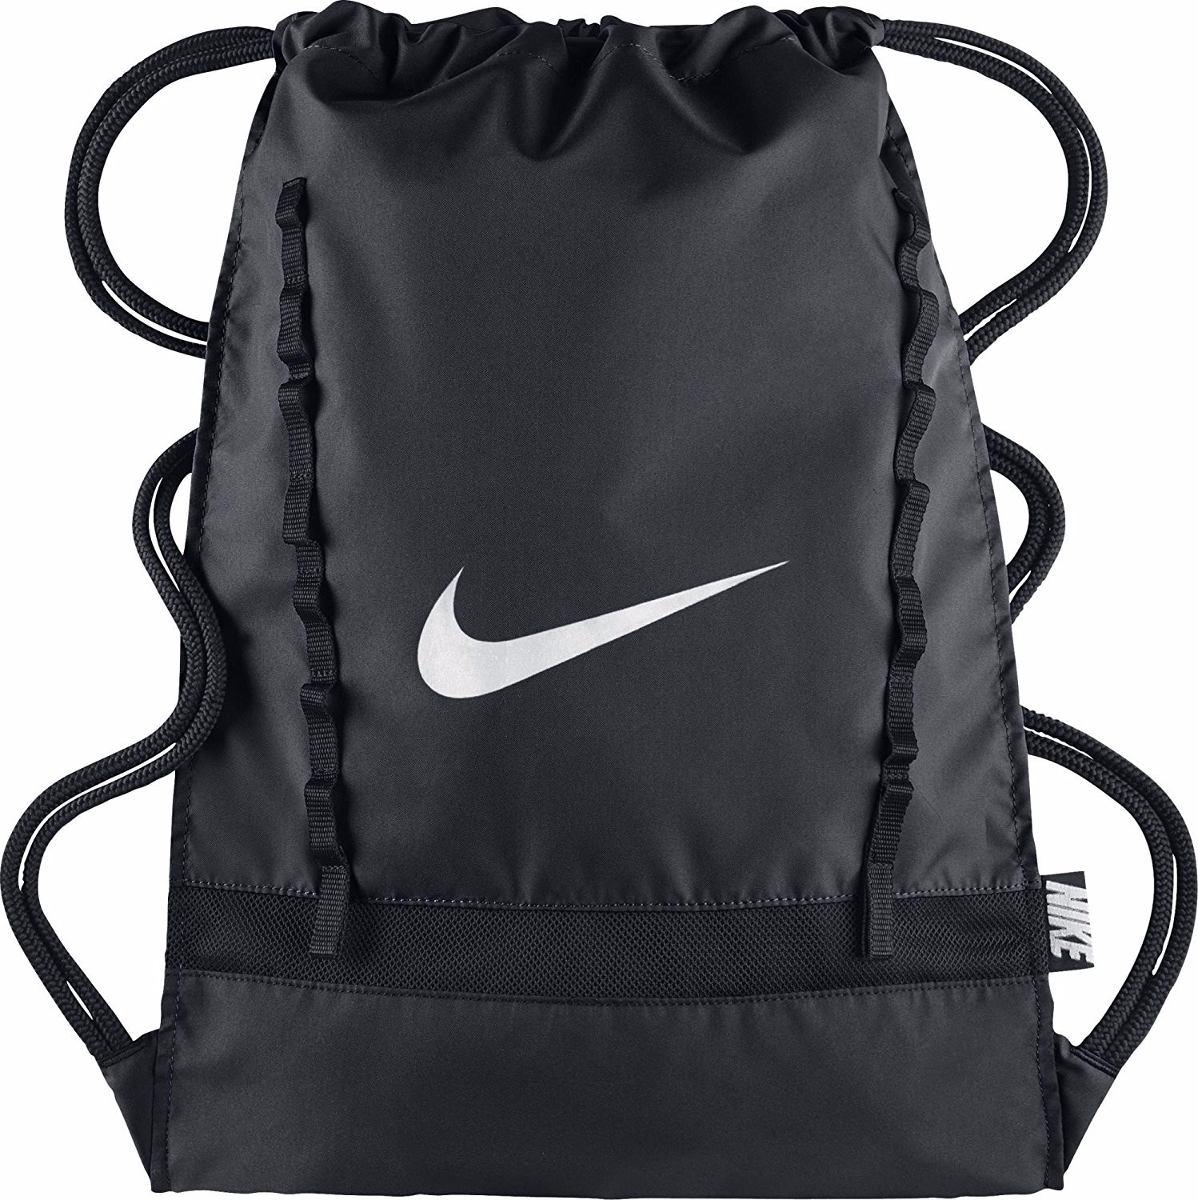 Nike Mochila Tela Sack Agua Brasilia 7 Resistente Gym Al PqdSFdw